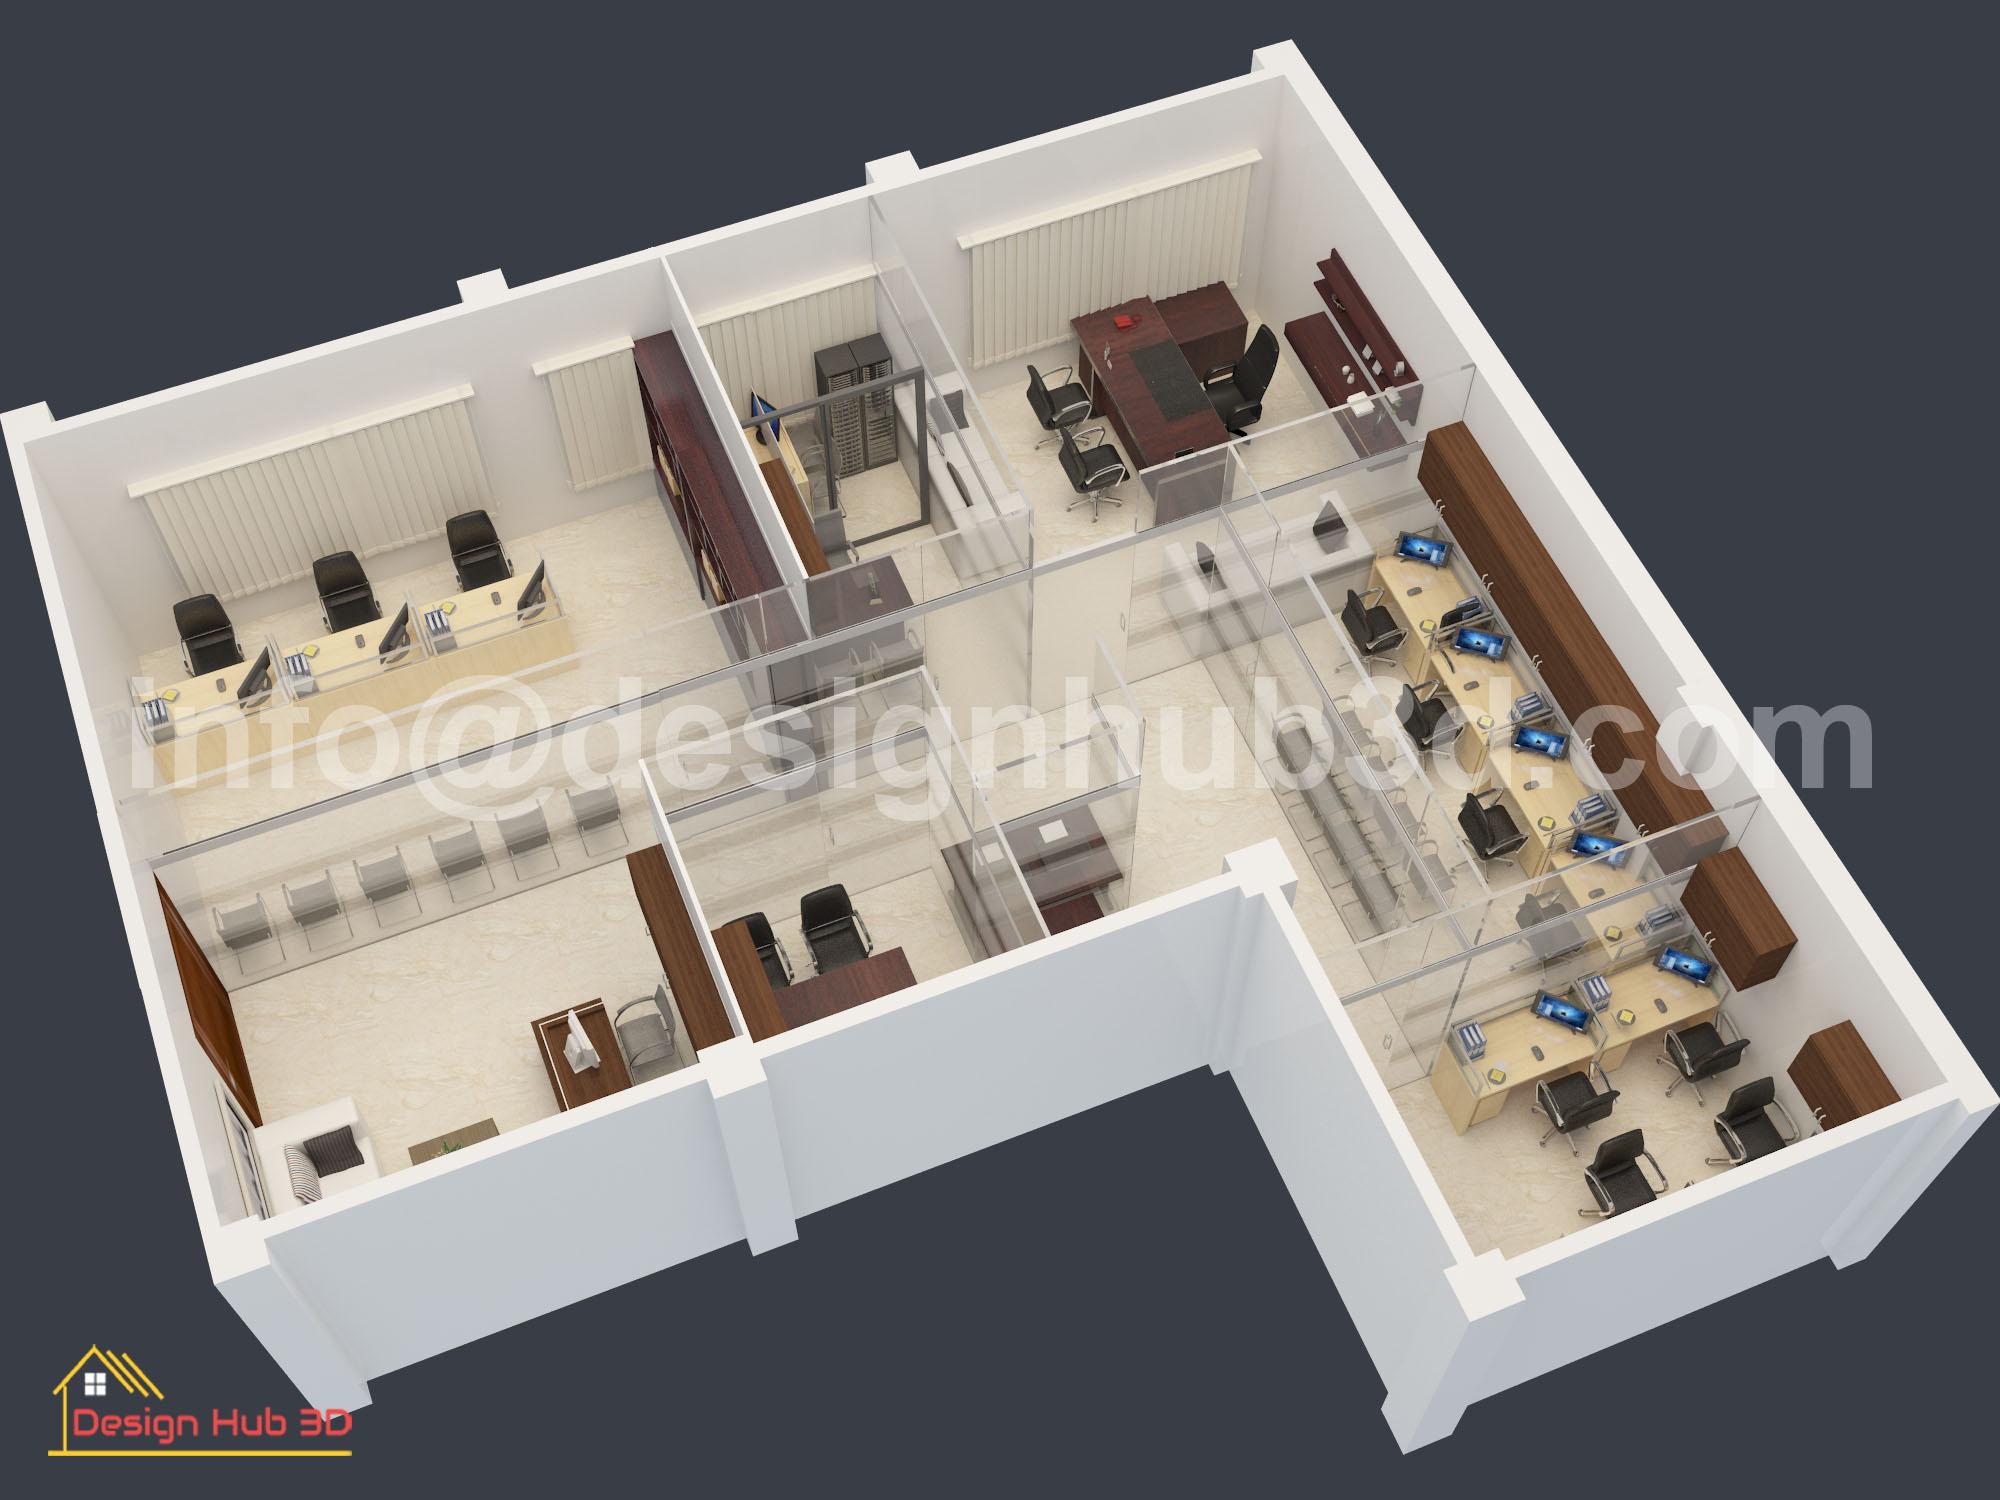 DesignHub 3D-Office Decor, Office Interior, Interior Design, Corporate Hub Design, Corporate Office Interior, Top View